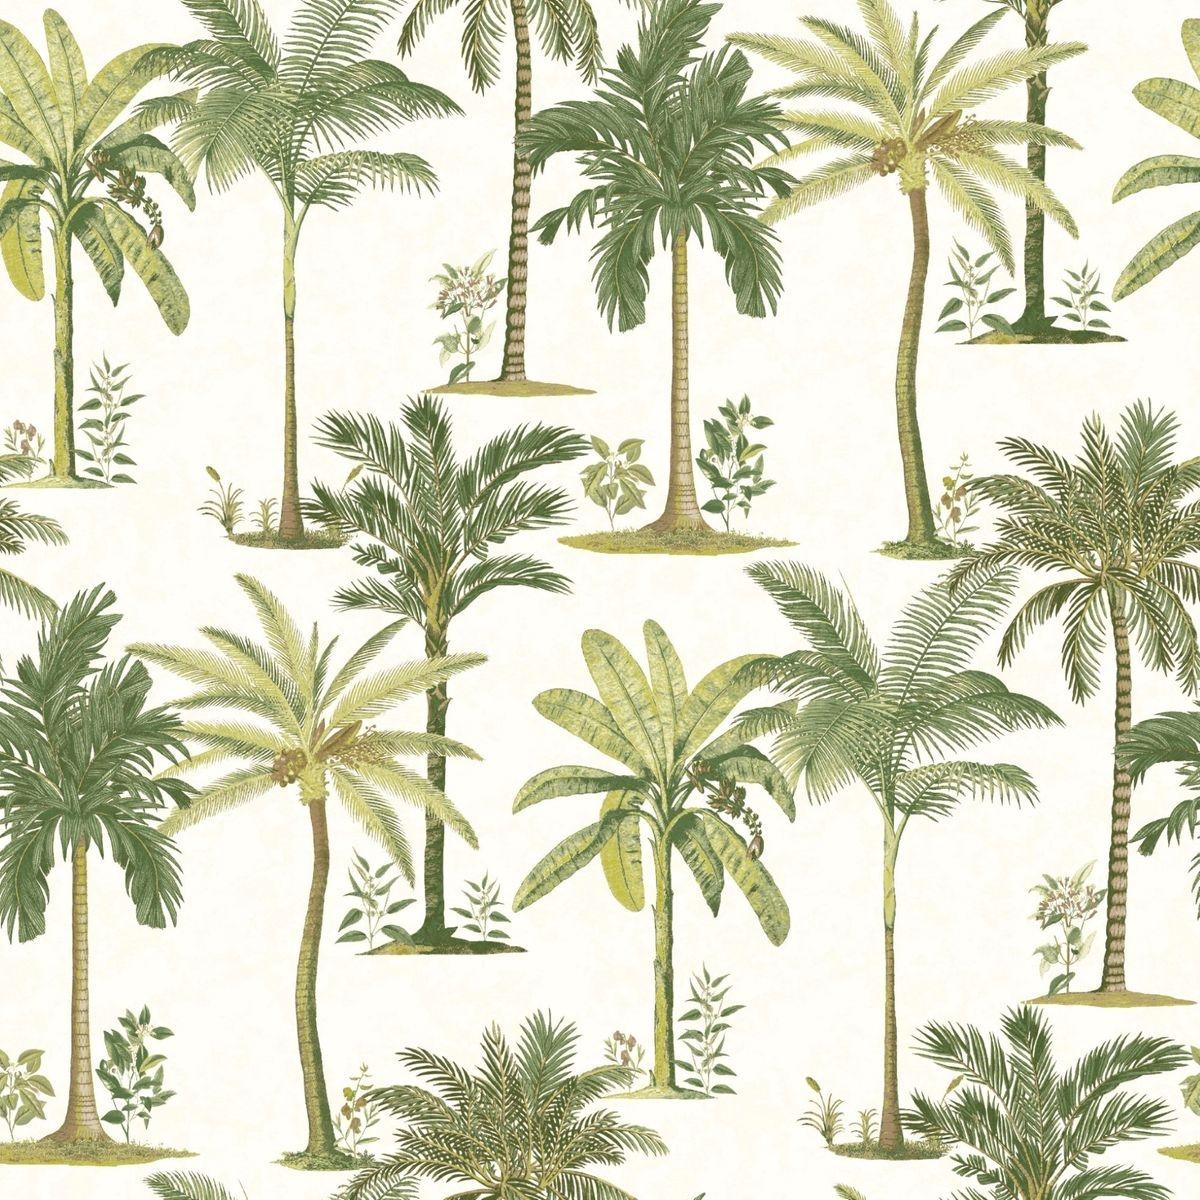 Superfresco Easy Papier Peint Support Intissé Palm Beach Vinyle 1005 x 52 cm Vert & Blanc